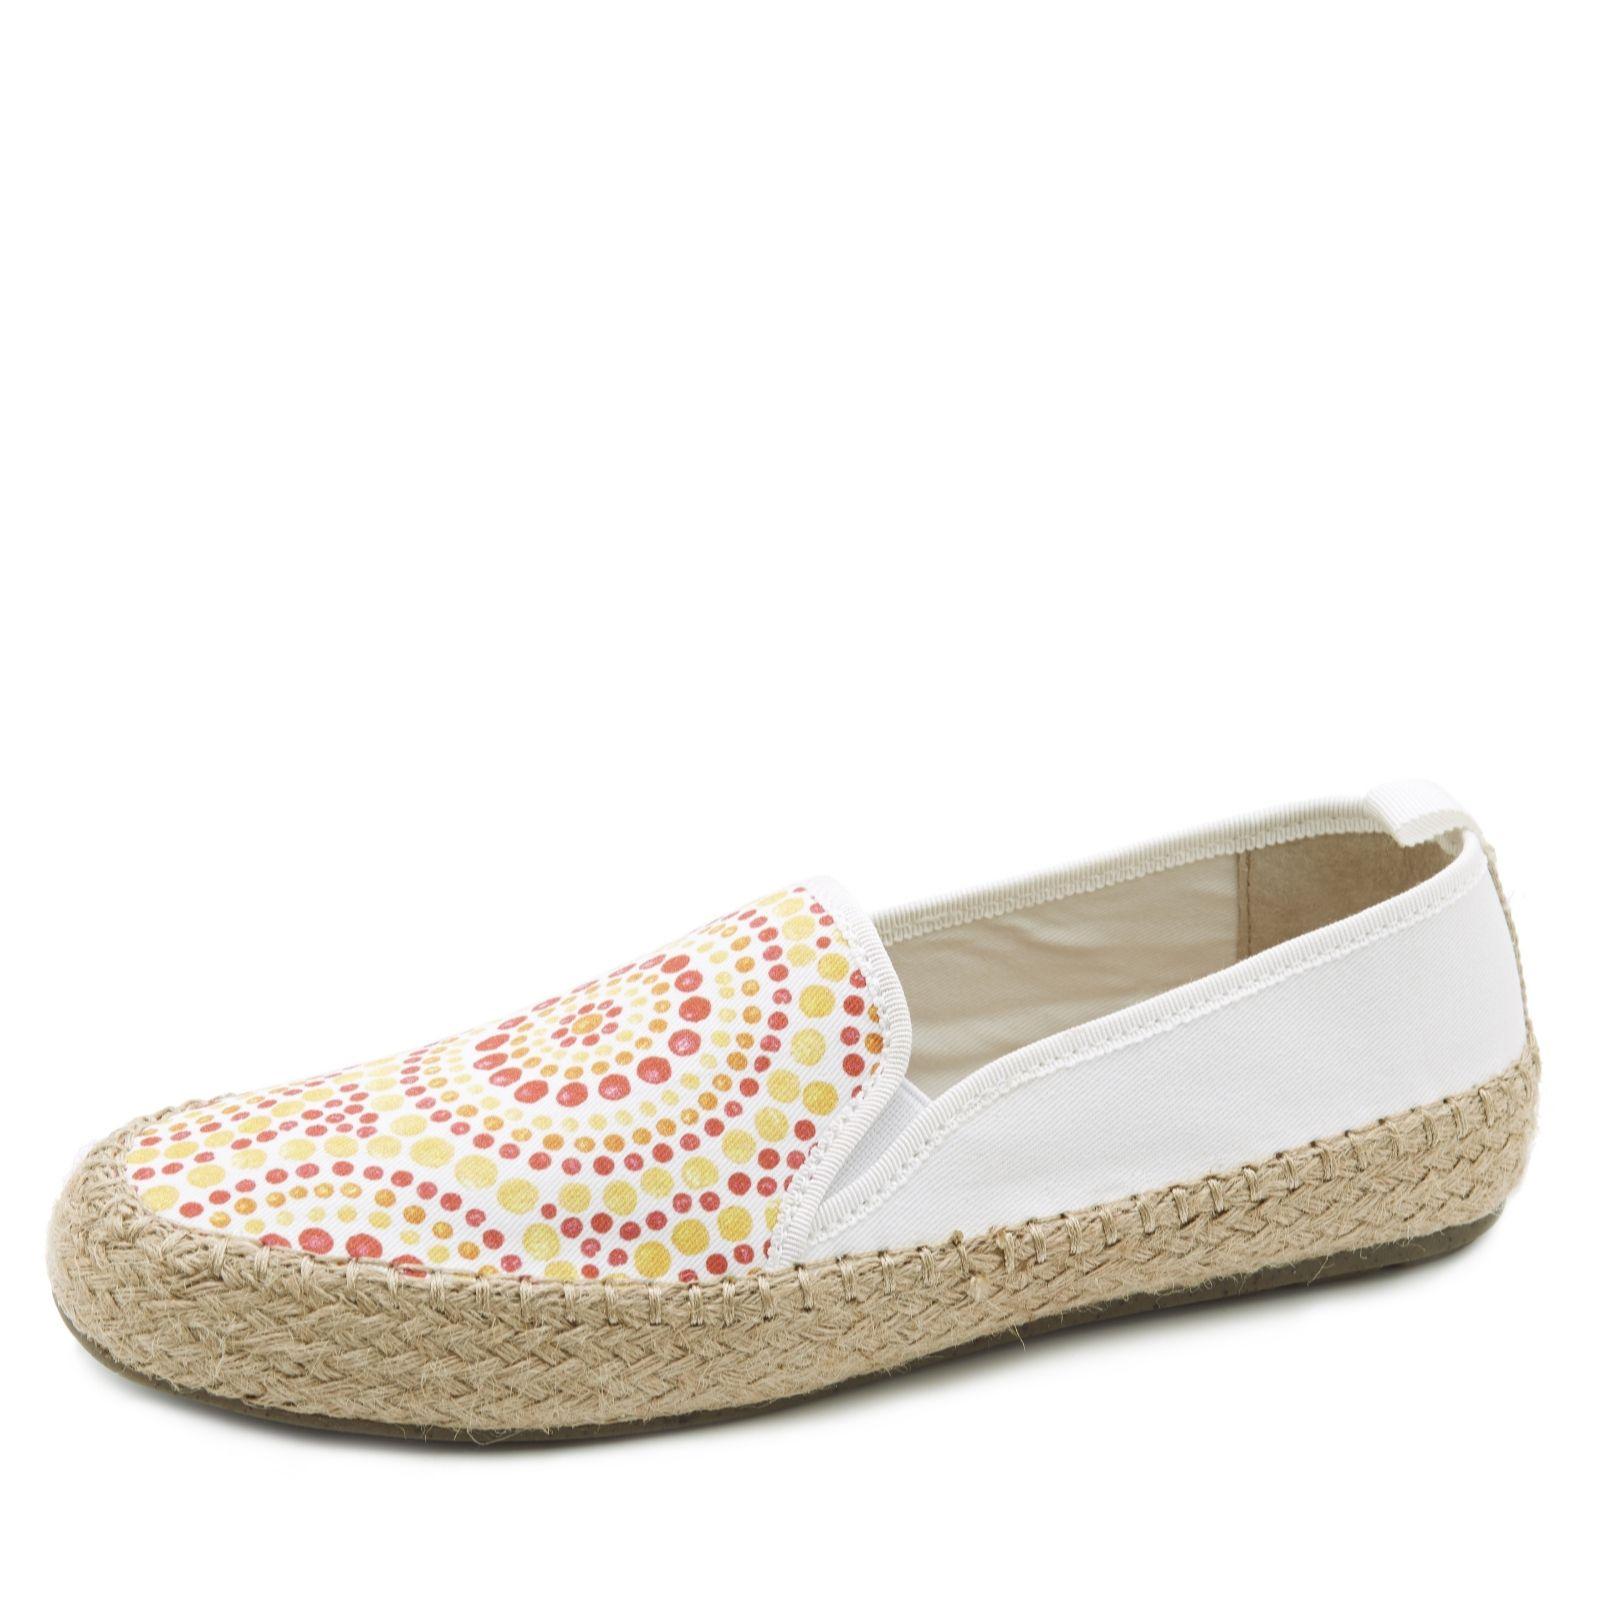 d9373678b9 Emu Gum Espadrille Style Slip On Shoe - QVC UK